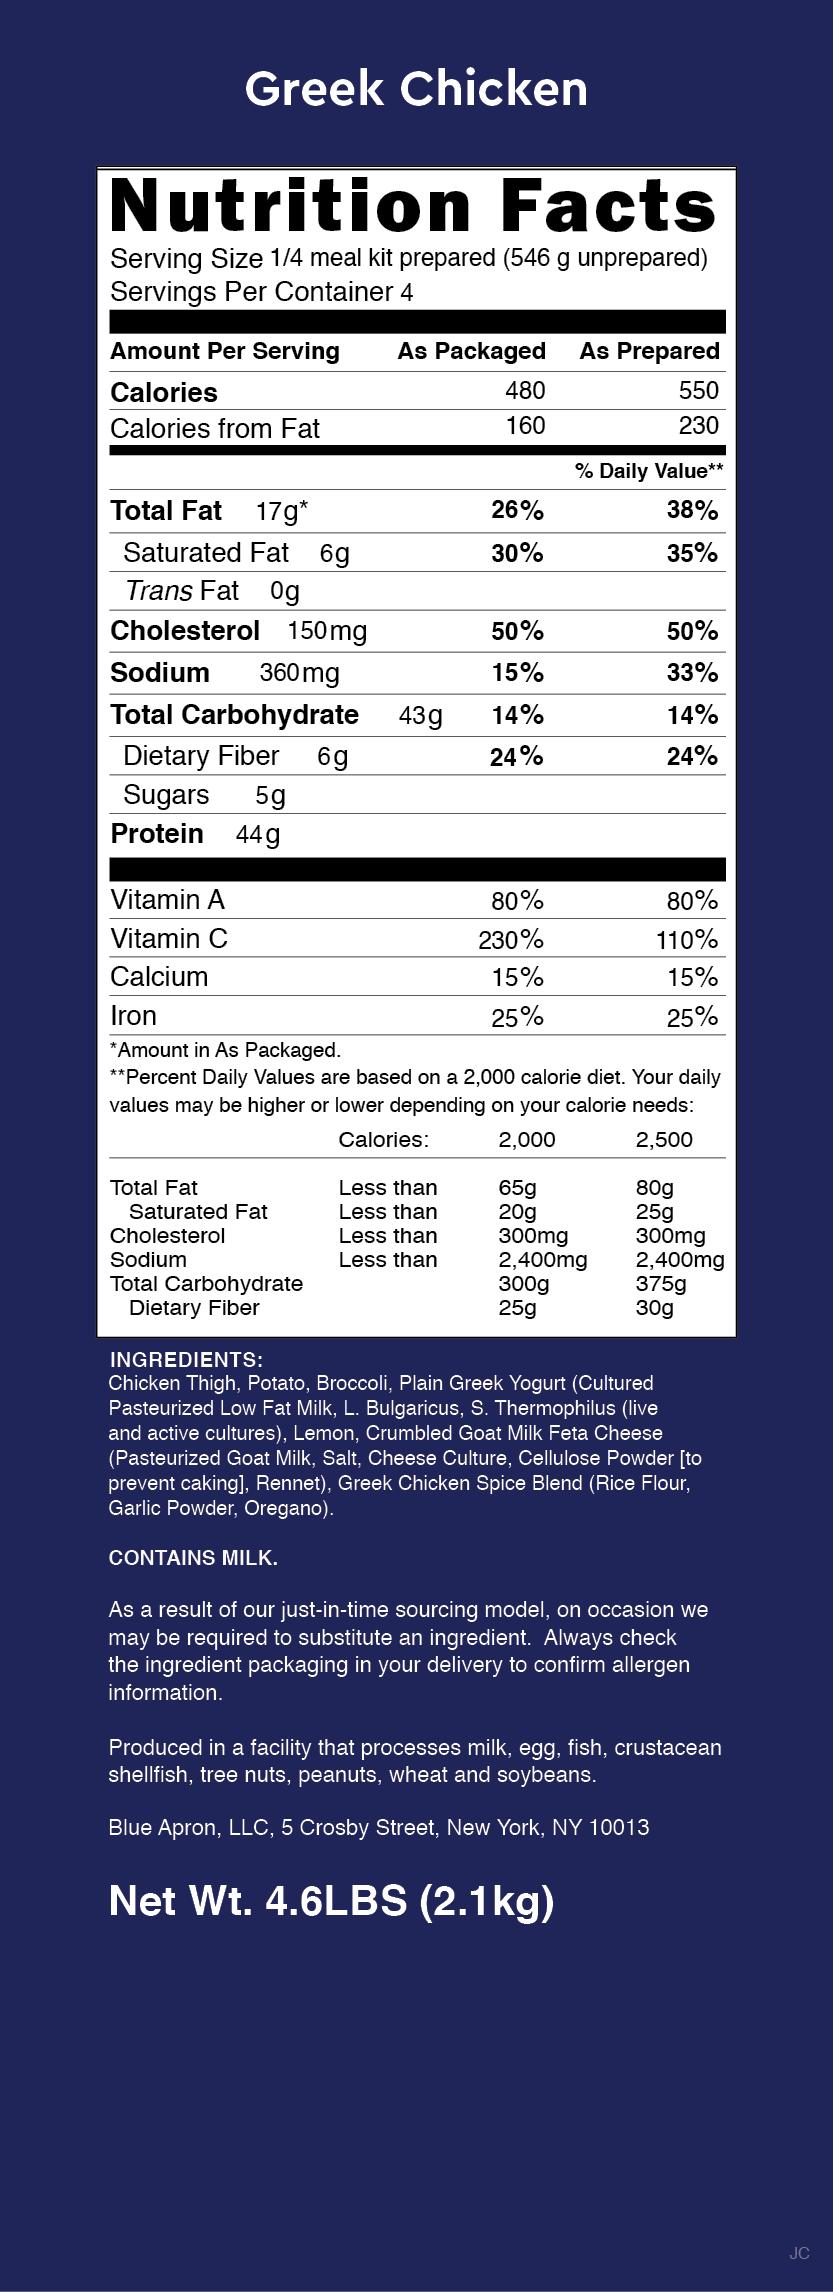 Blue apron greek chicken - Nutrition Label